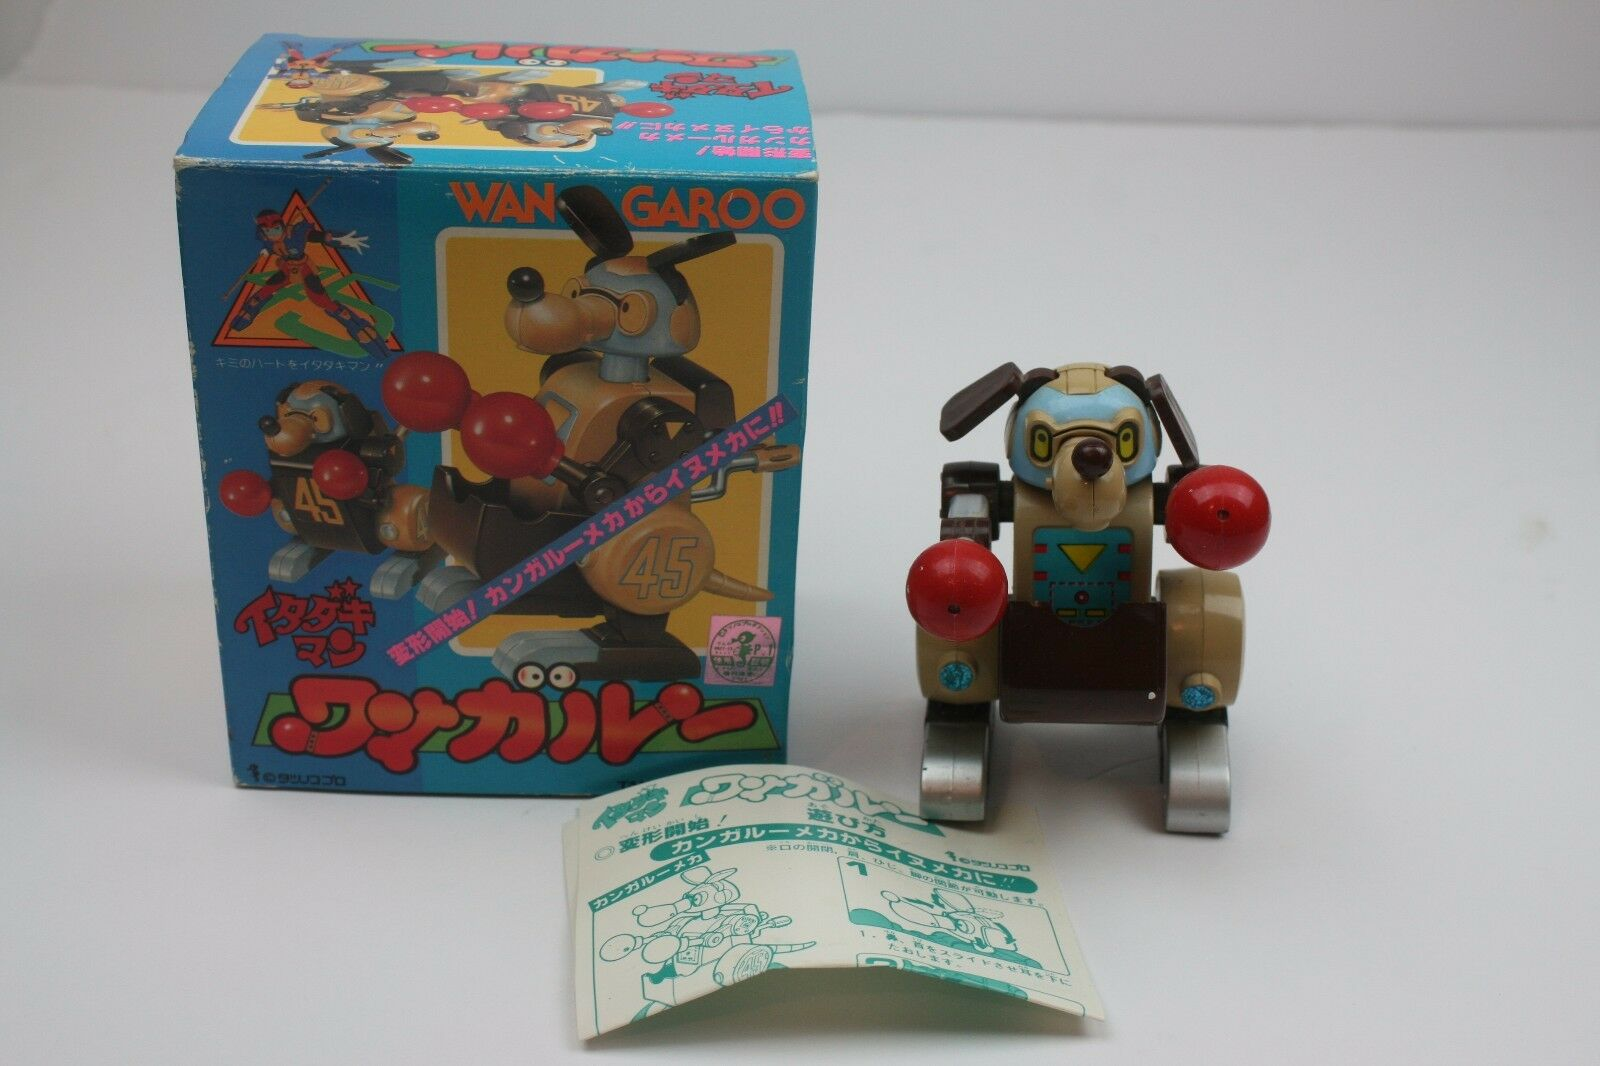 Vintage '80s ITADAKIMAN WANGAROO Takatoku ST JAPAN